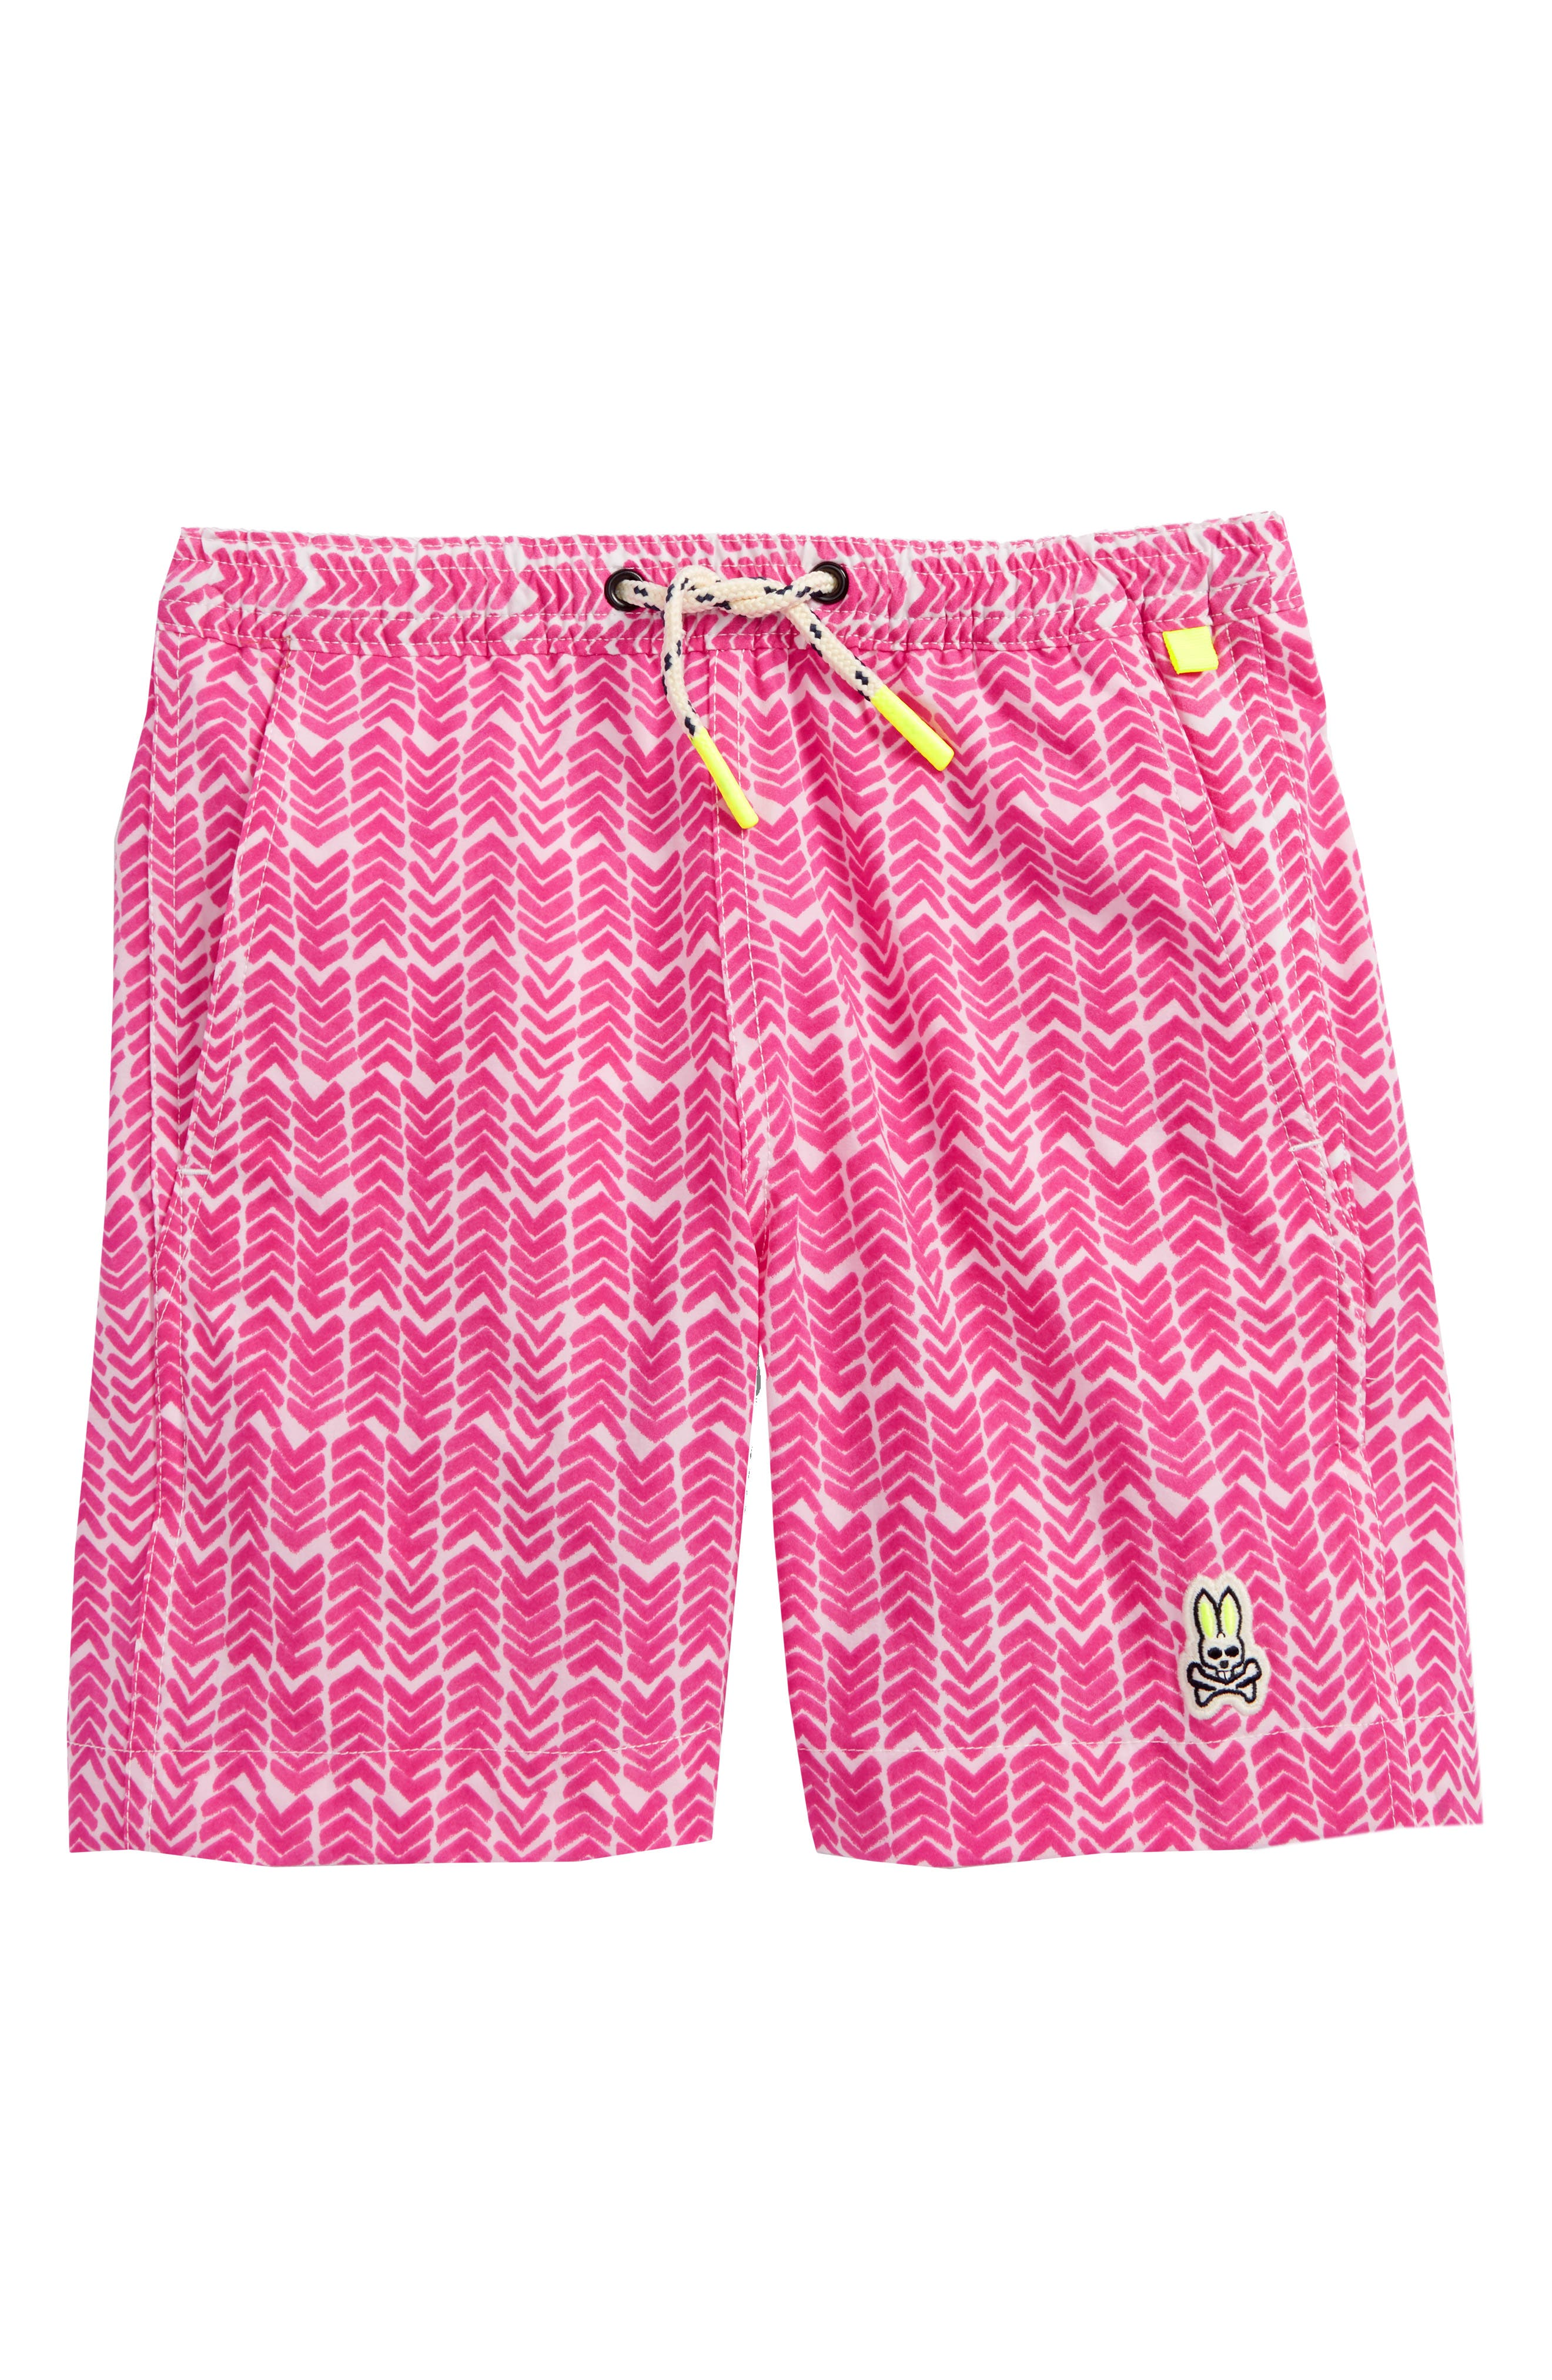 Watermark Herringbone Swim Trunks,                         Main,                         color, Fushia